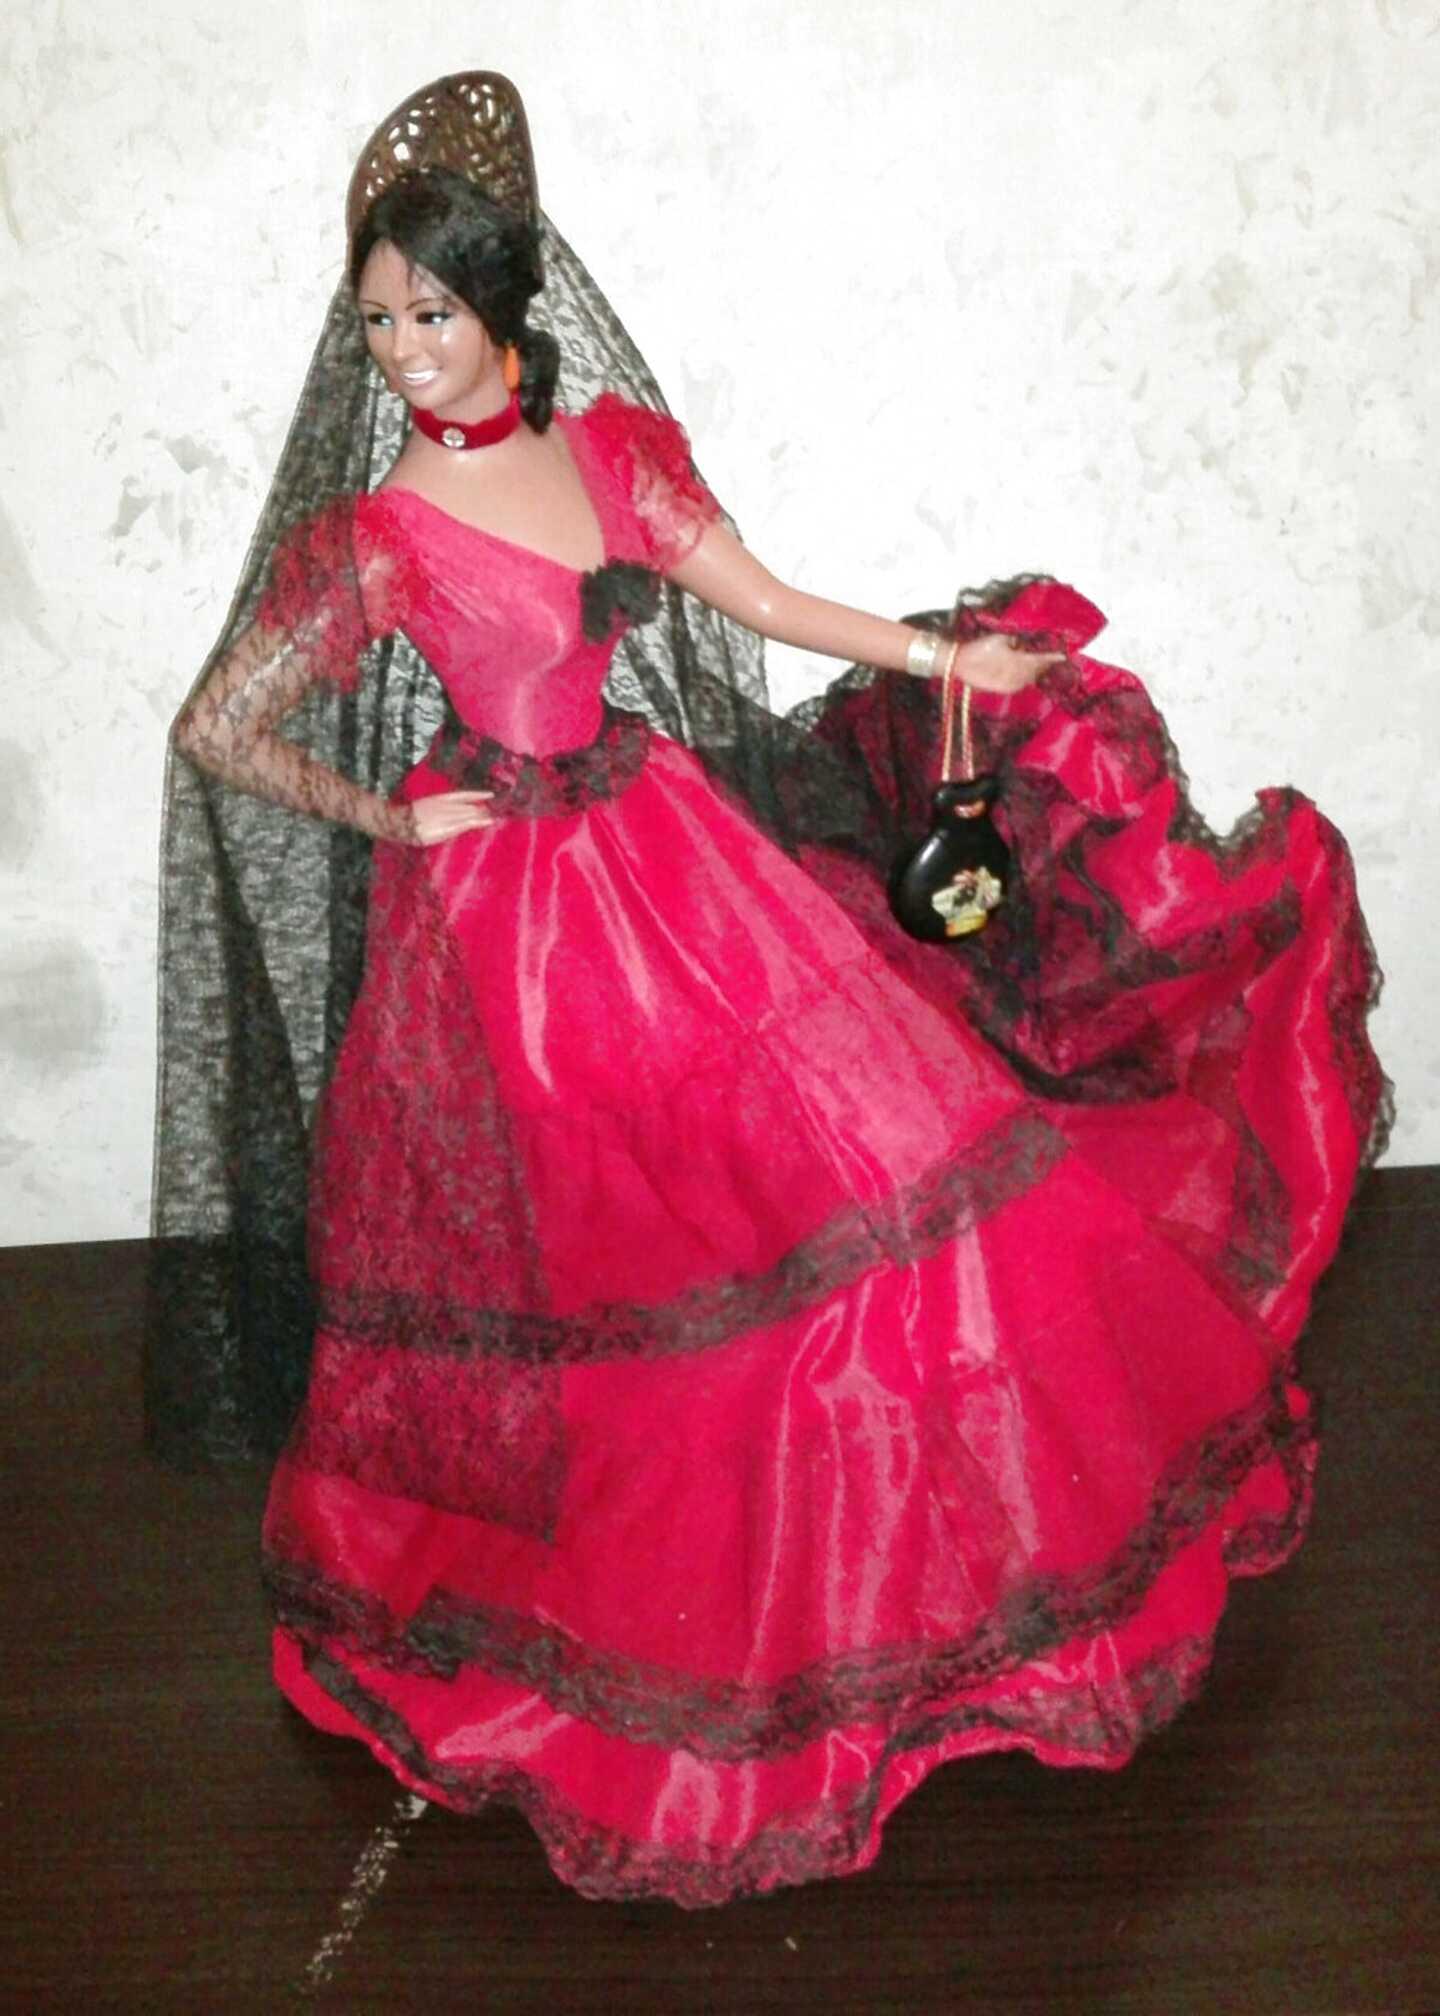 bambola in spagnolo